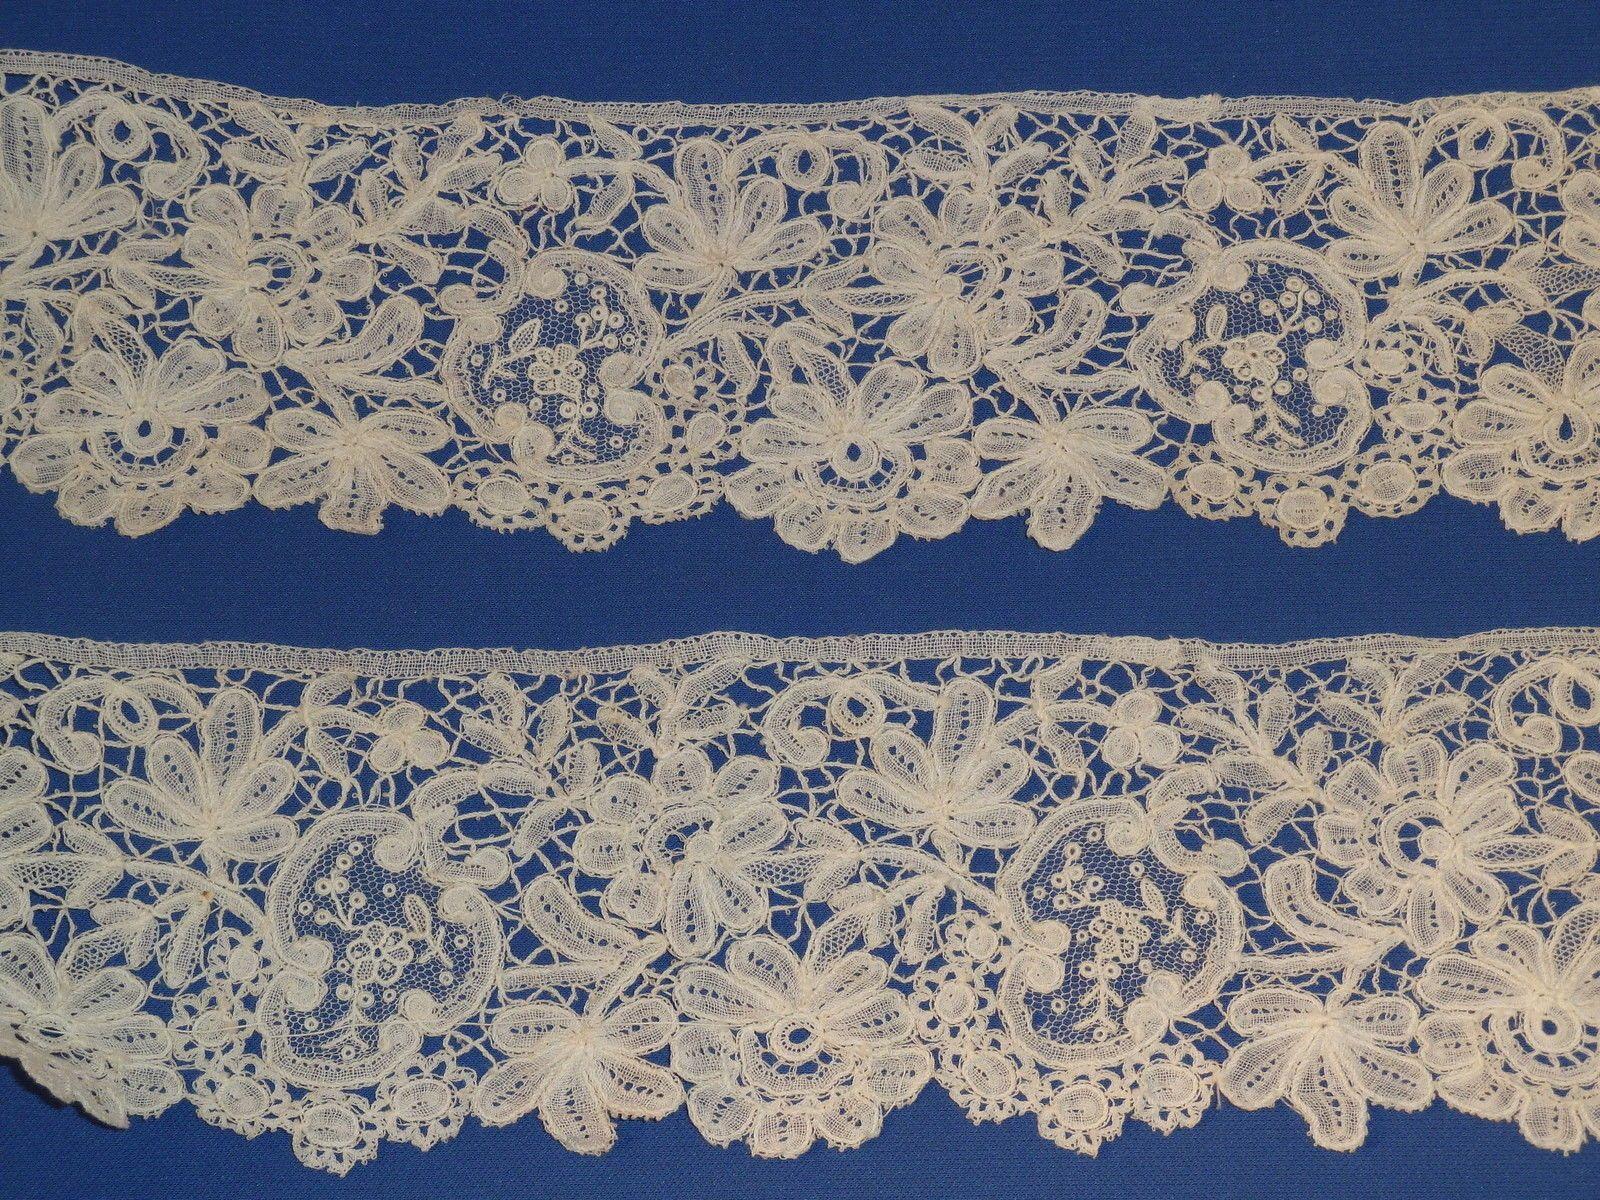 "Antique Brussels Duchesse Point de Gaze Lace Trim 86"" x 2 ¾"" Wedding | eBay"